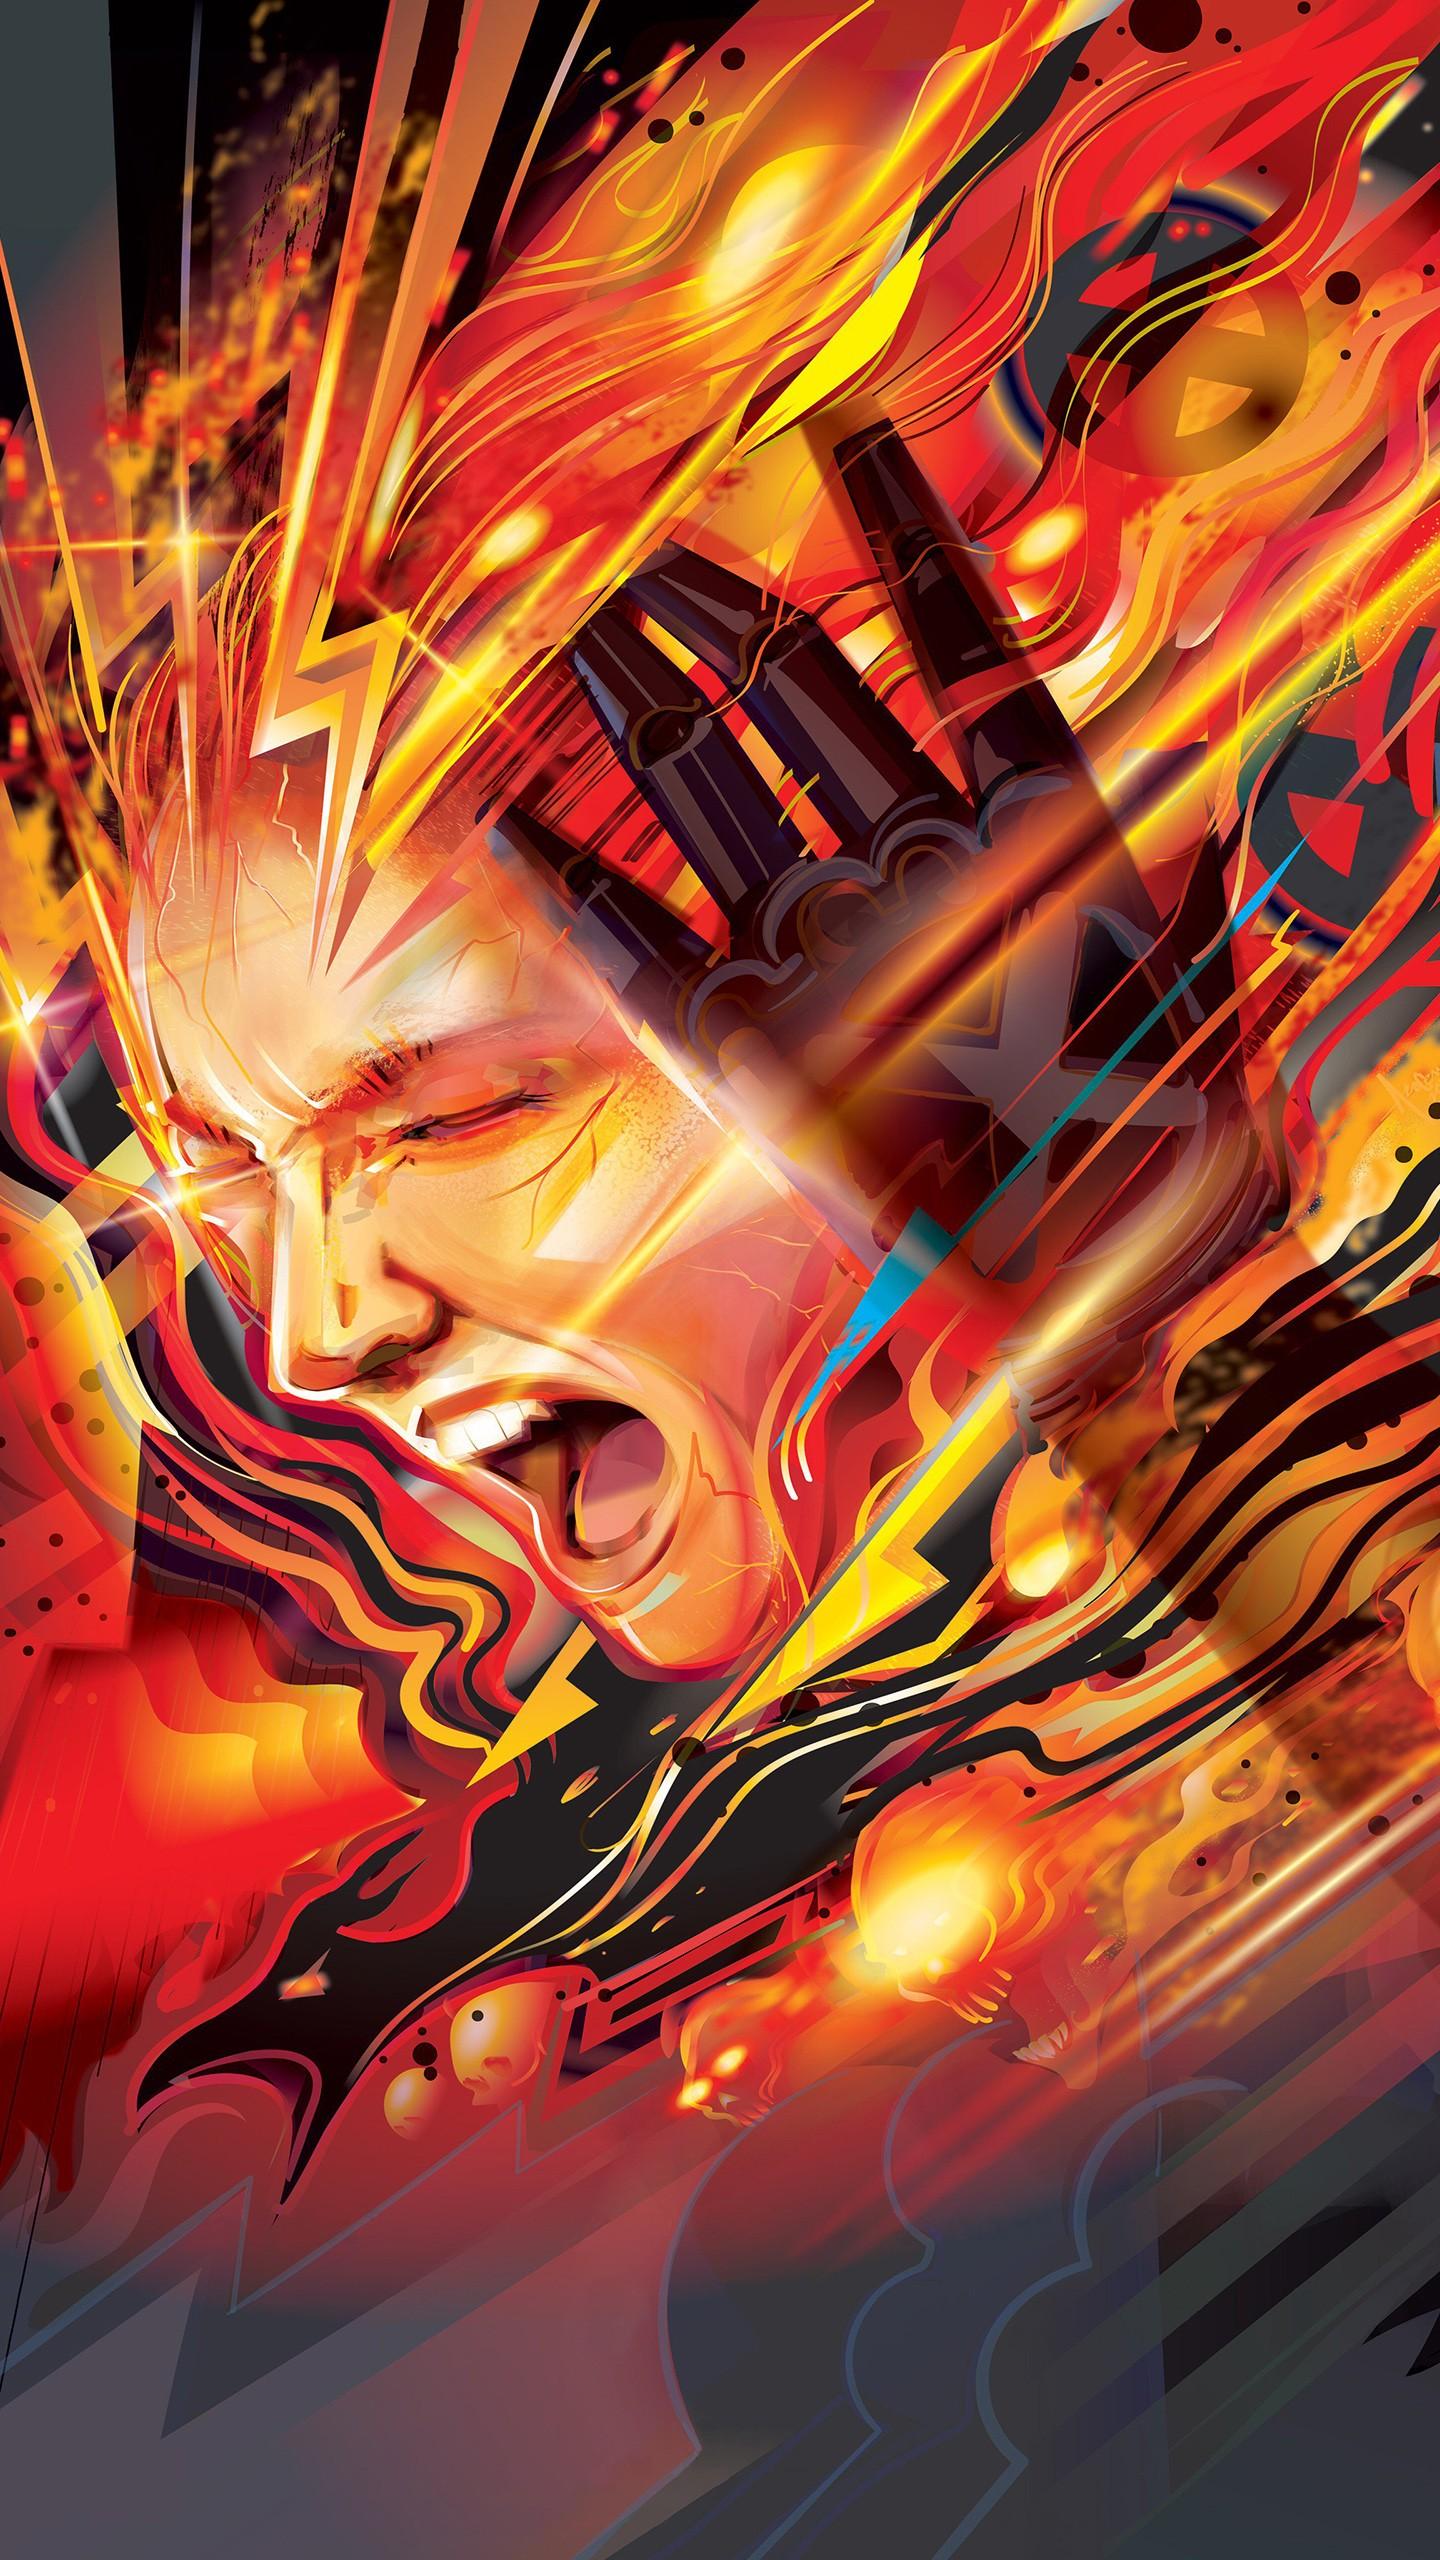 Iron Man 3d Hd Wallpaper Dark Phoenix 2019 Wallpapers Hd Wallpapers Id 27989